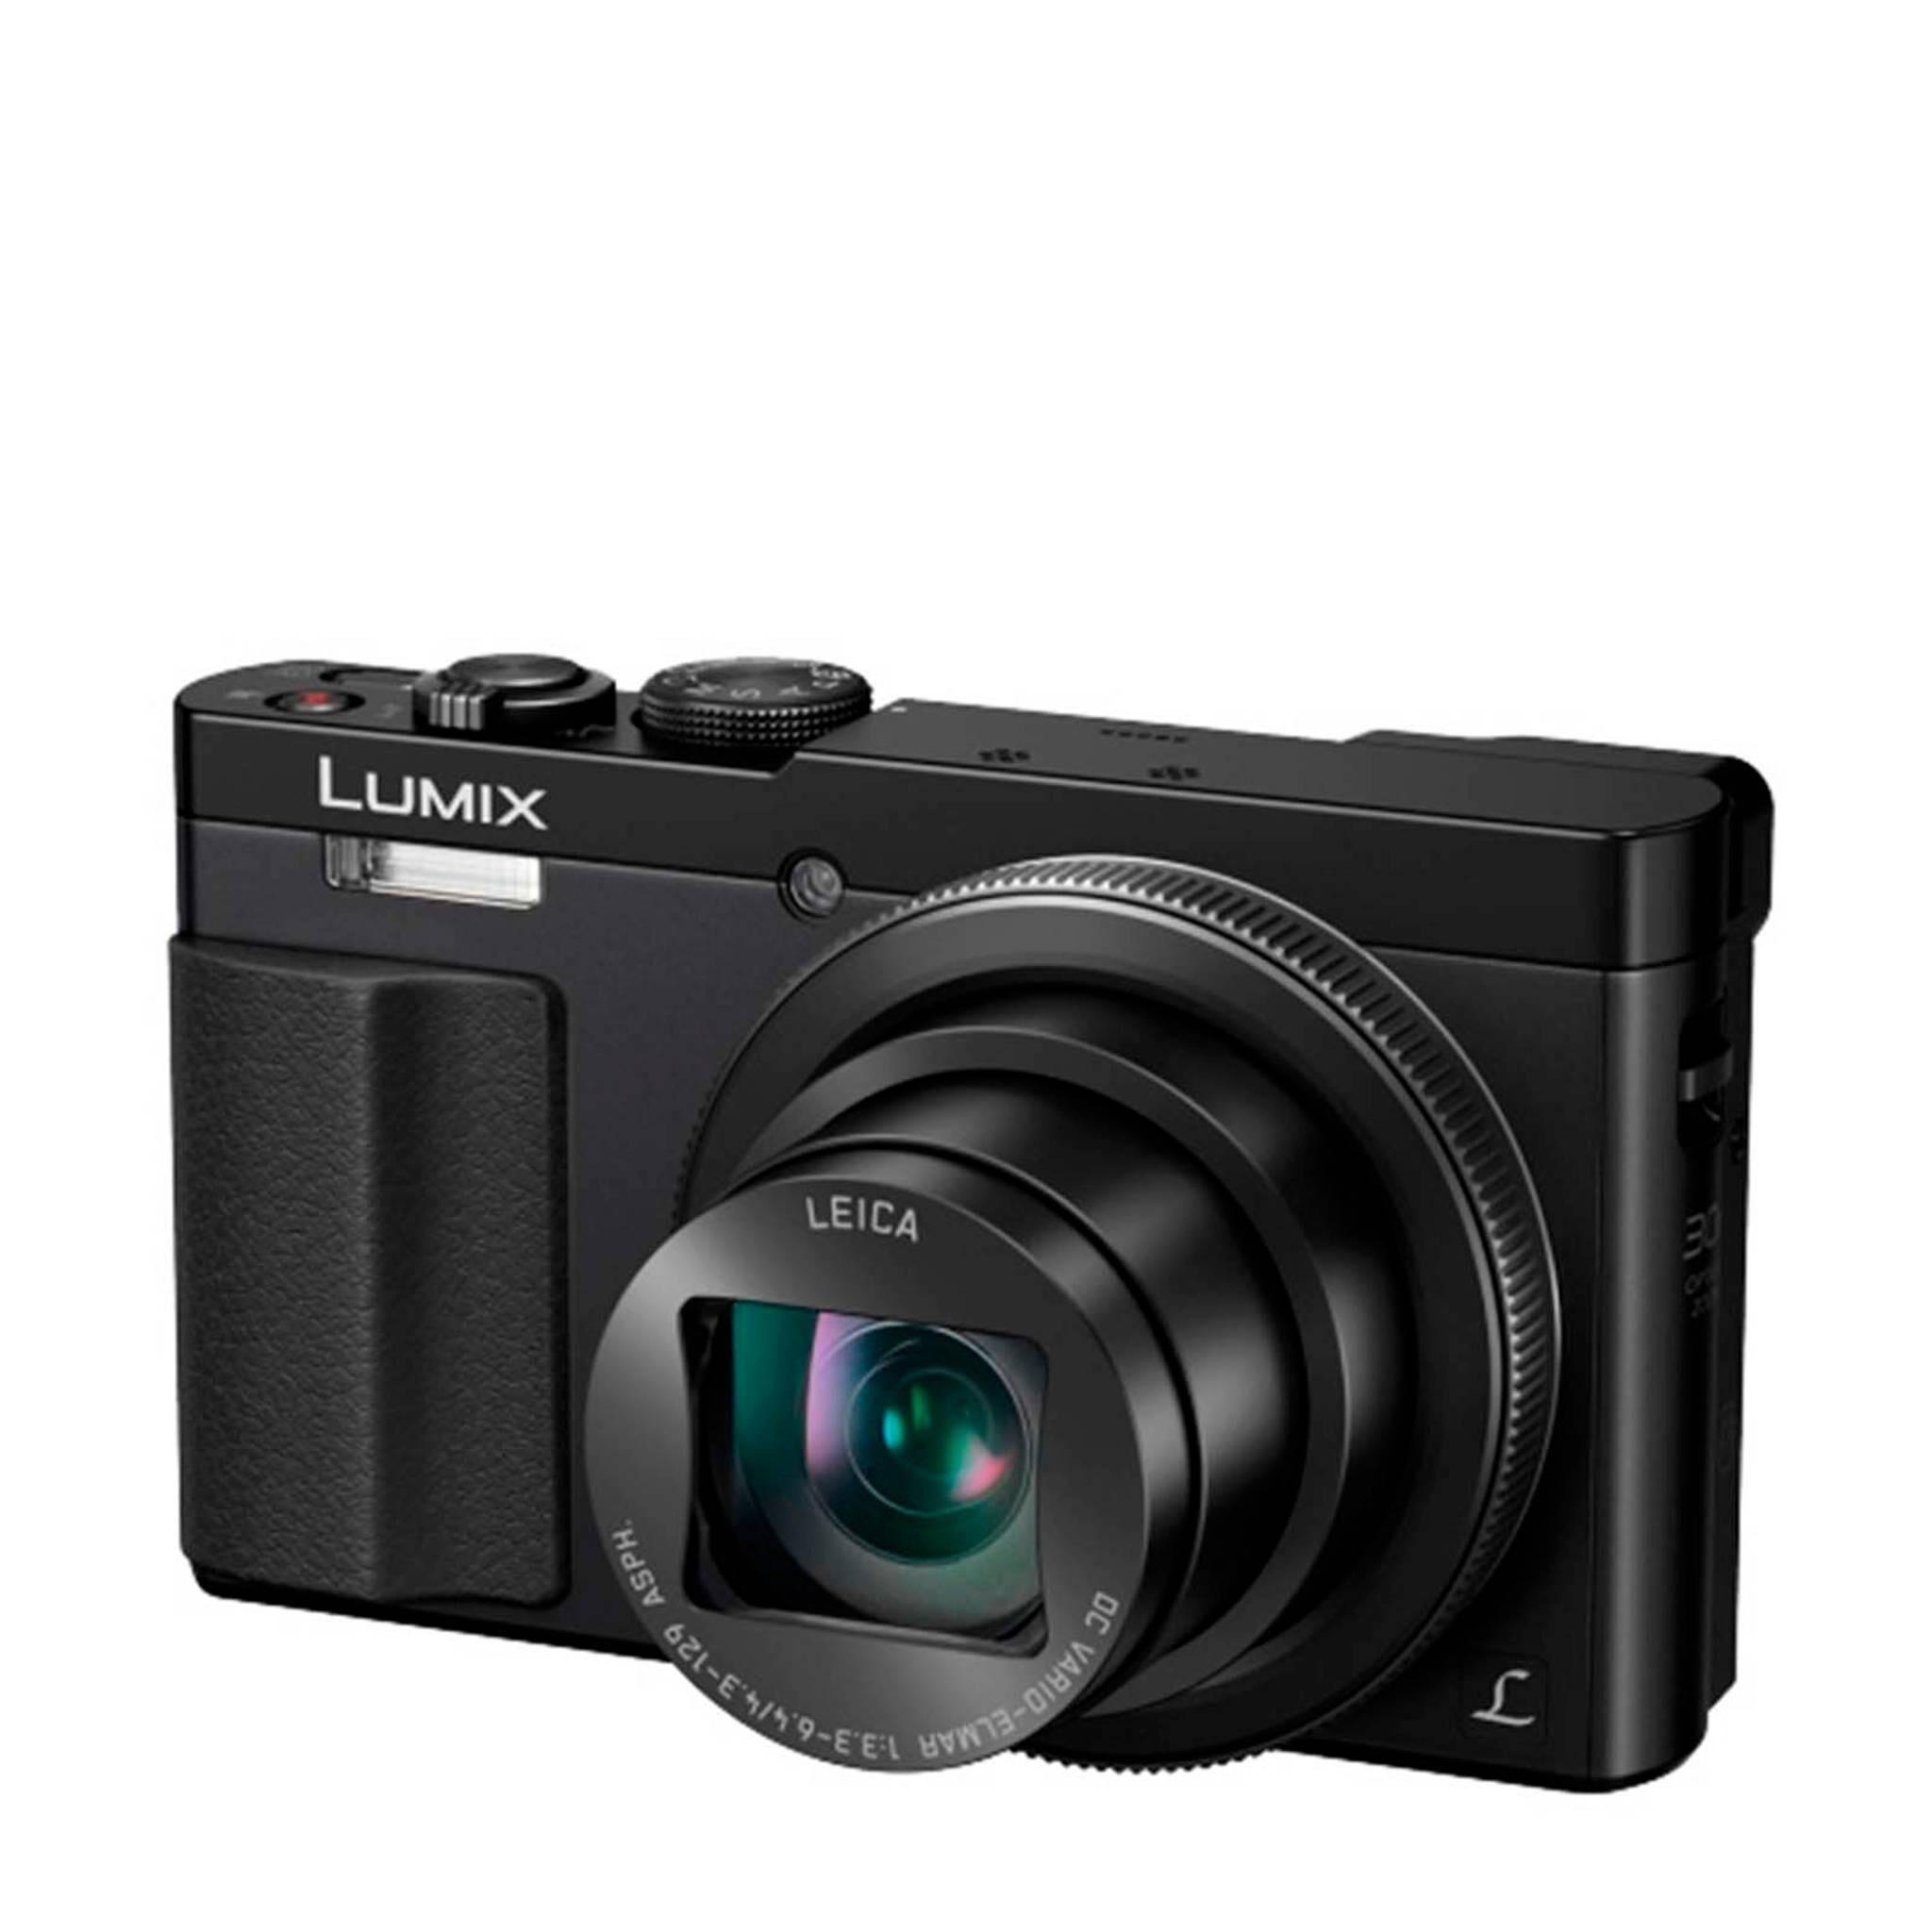 Compact Camera Panasonic Lumix DMC-TZ70 Black | Refurbished - 12 M. Warranty